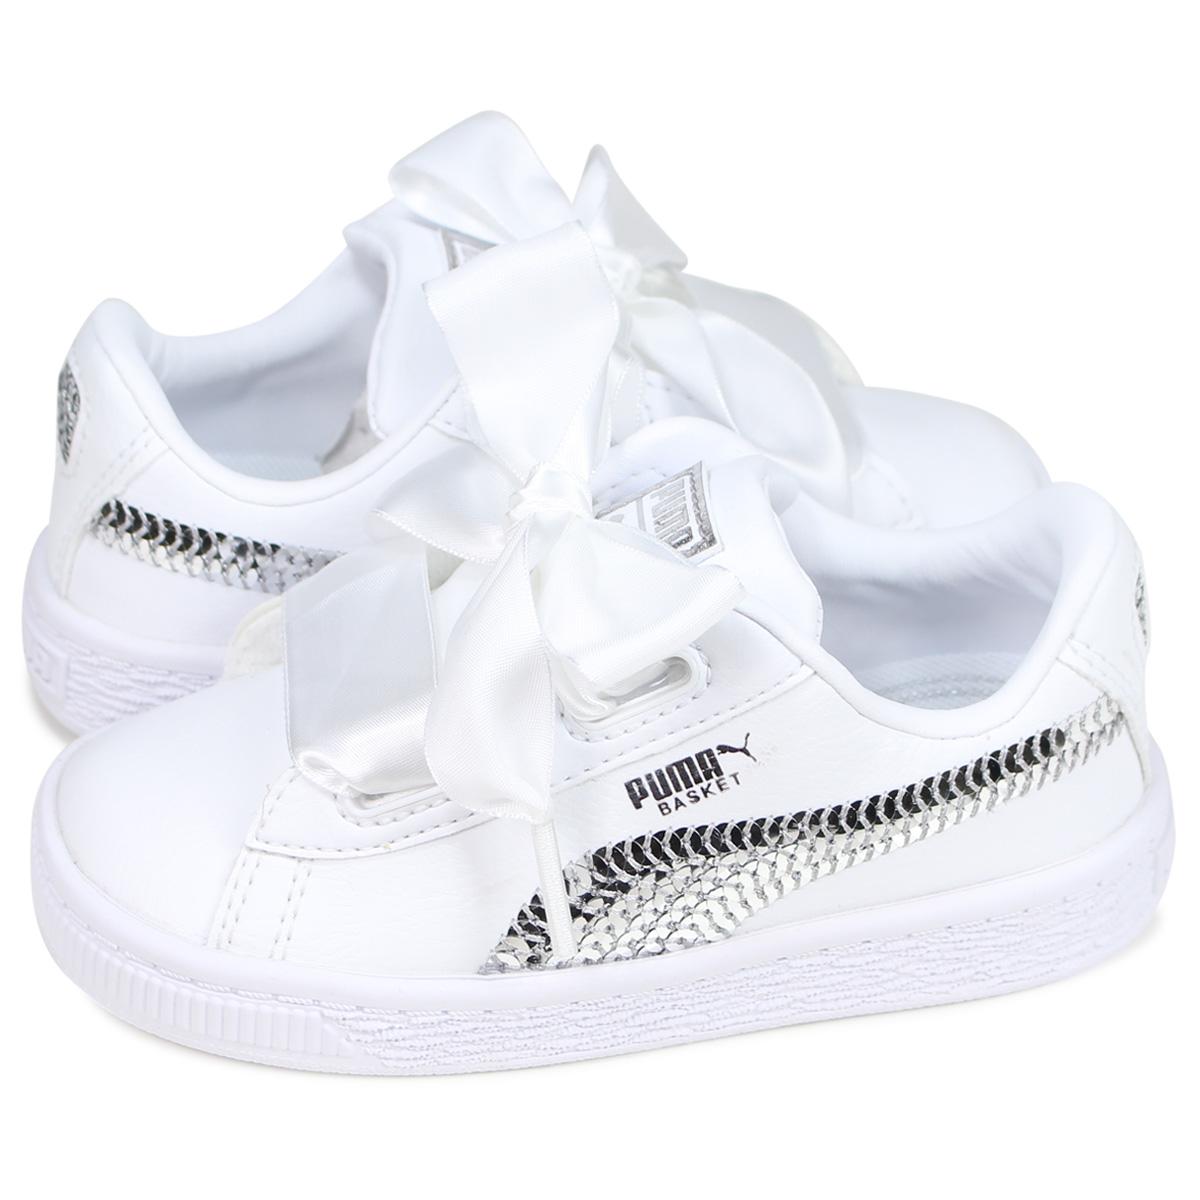 on sale 6d542 246ca PUMA BASKET HEART BLING INF Puma basket heart sneakers baby kids white  white 36684902 [6/21 Shinnyu load]